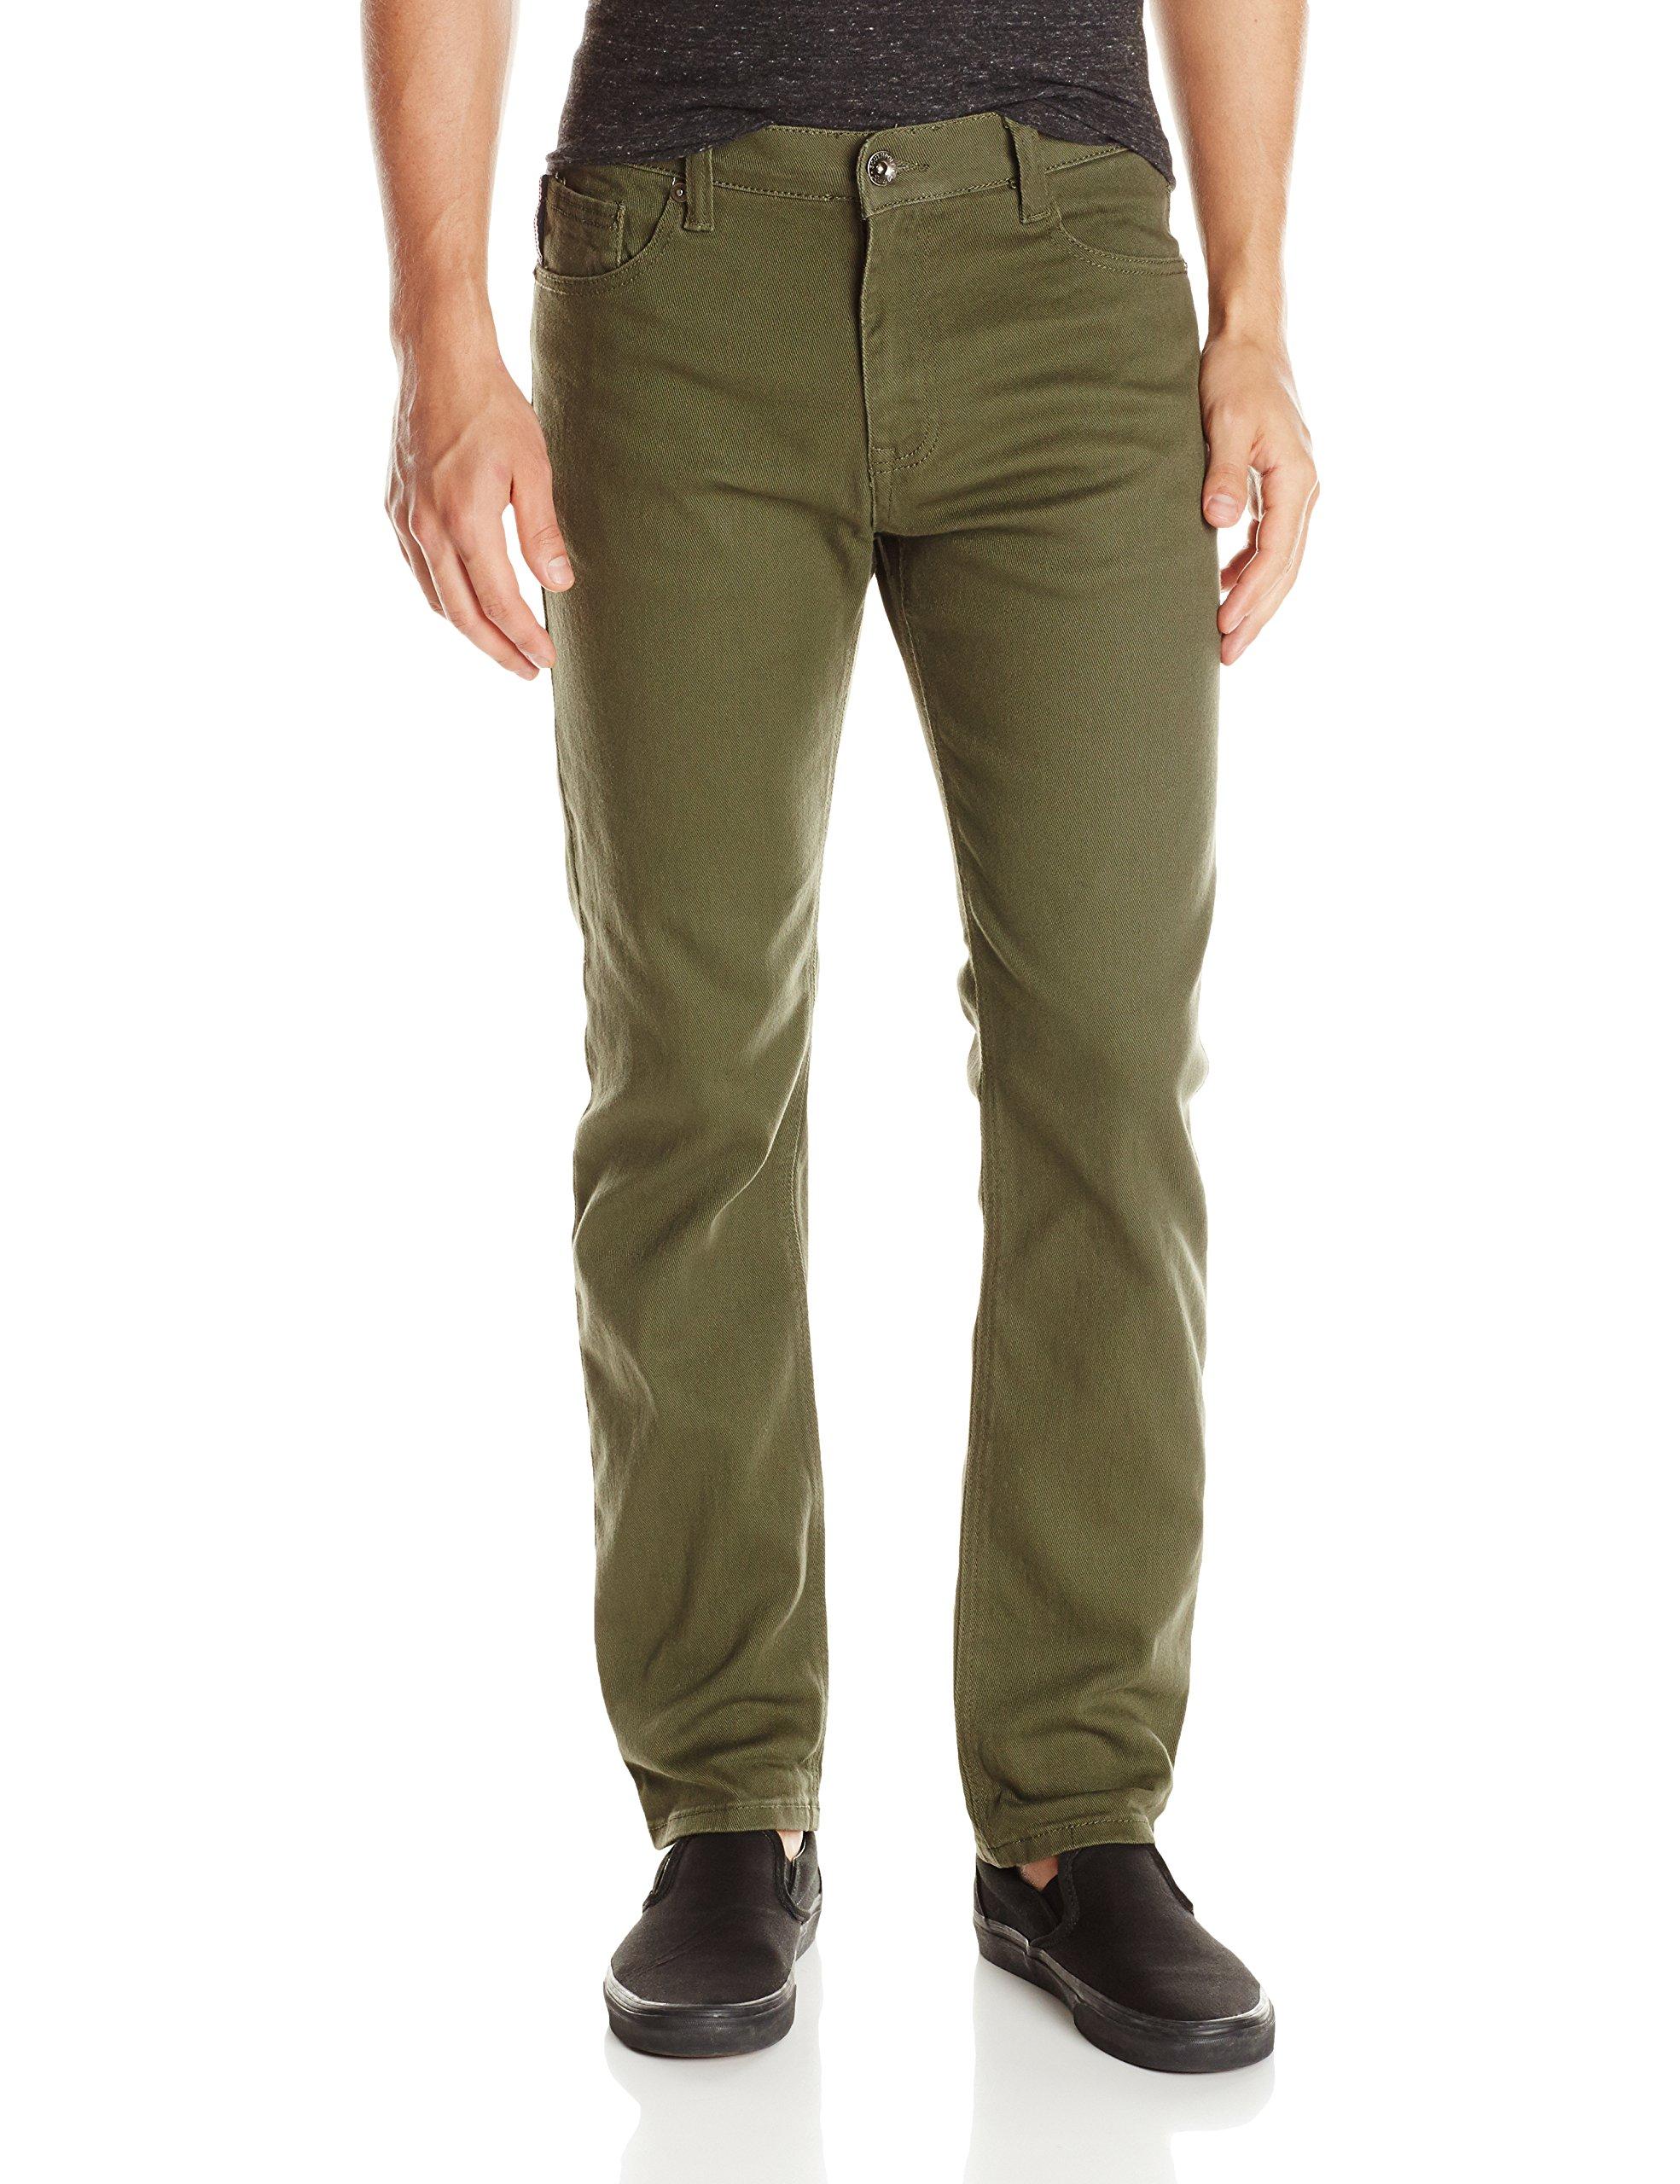 Southpole Men's Flex Stretch Basic Twill and Rinse Denim Pants, Olive, 34x32